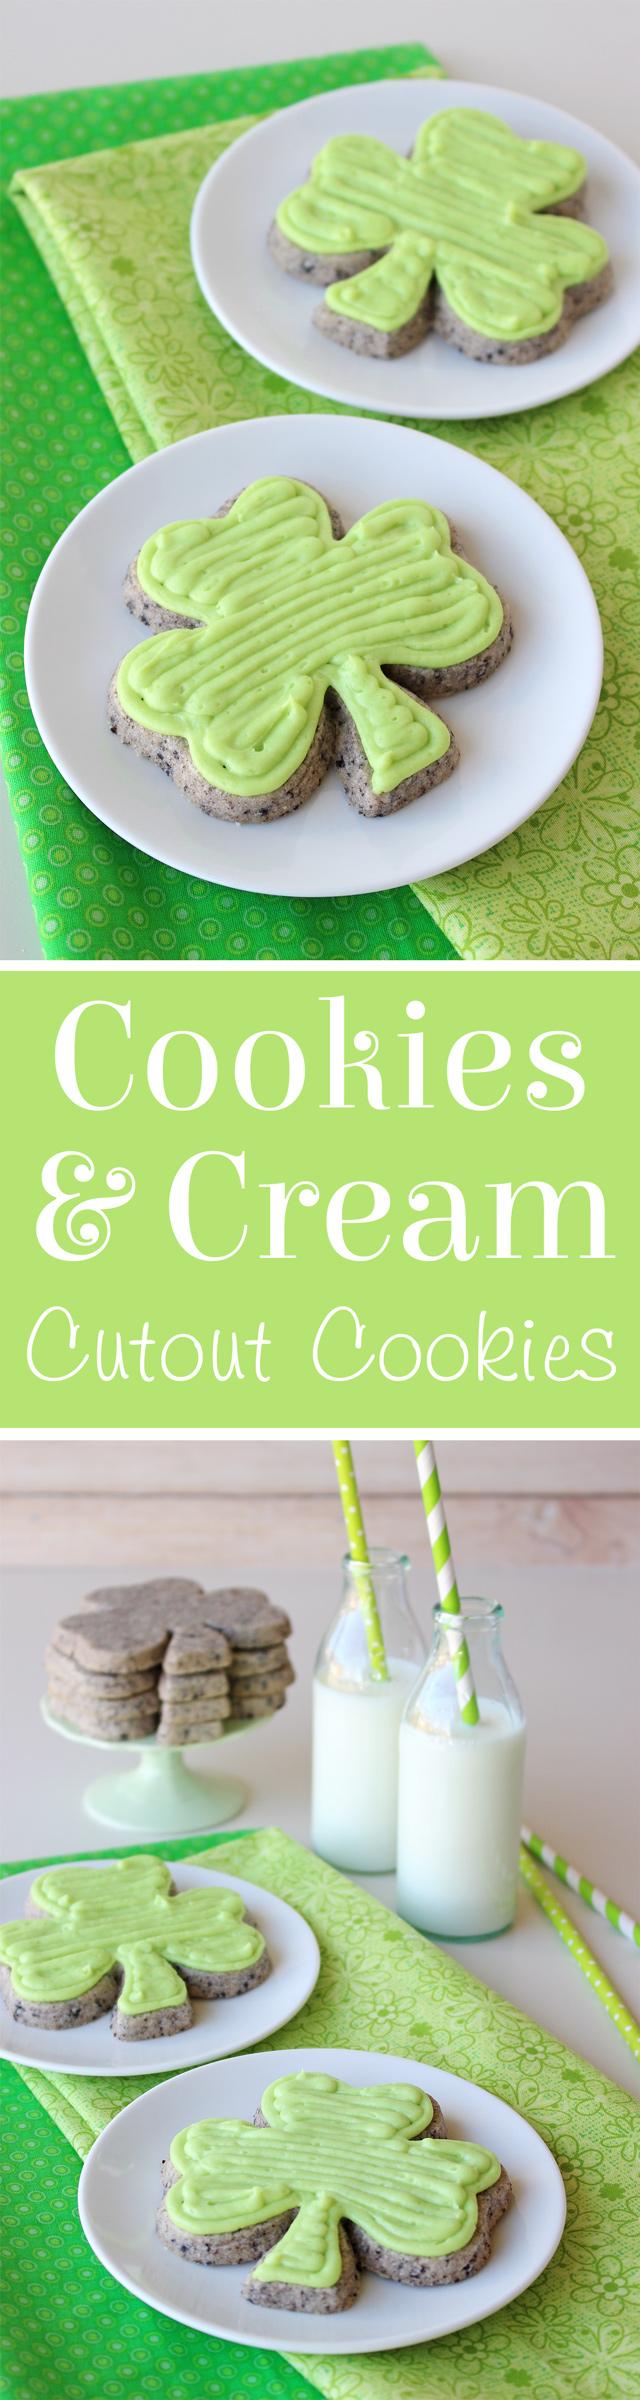 Oreo Cutout Cookies